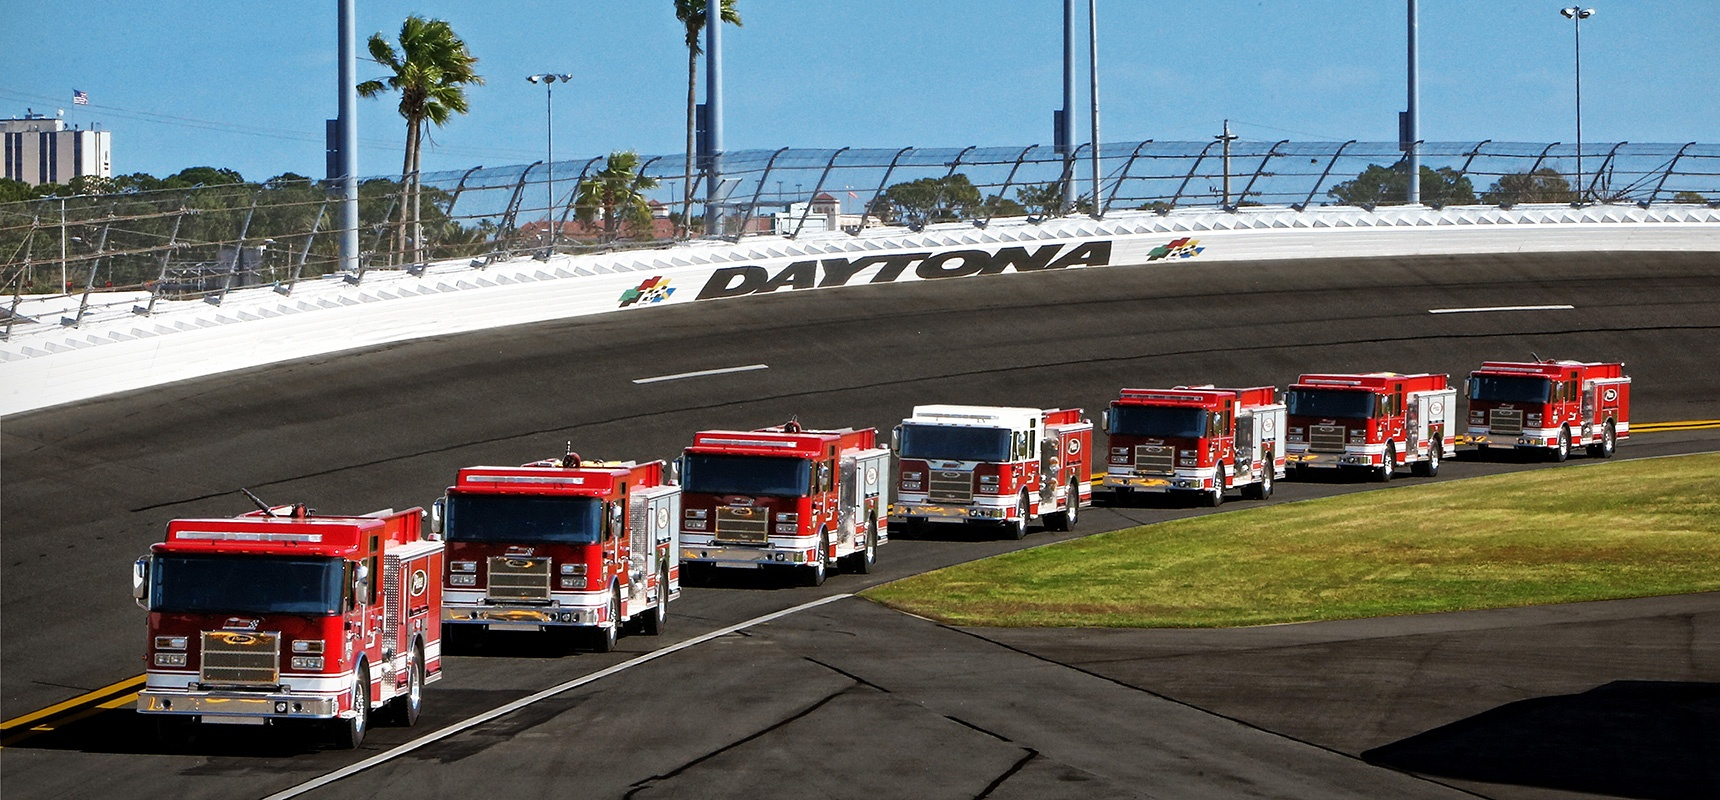 Daytona-International-Speedway-The-Fire-Brigade_Header.jpg